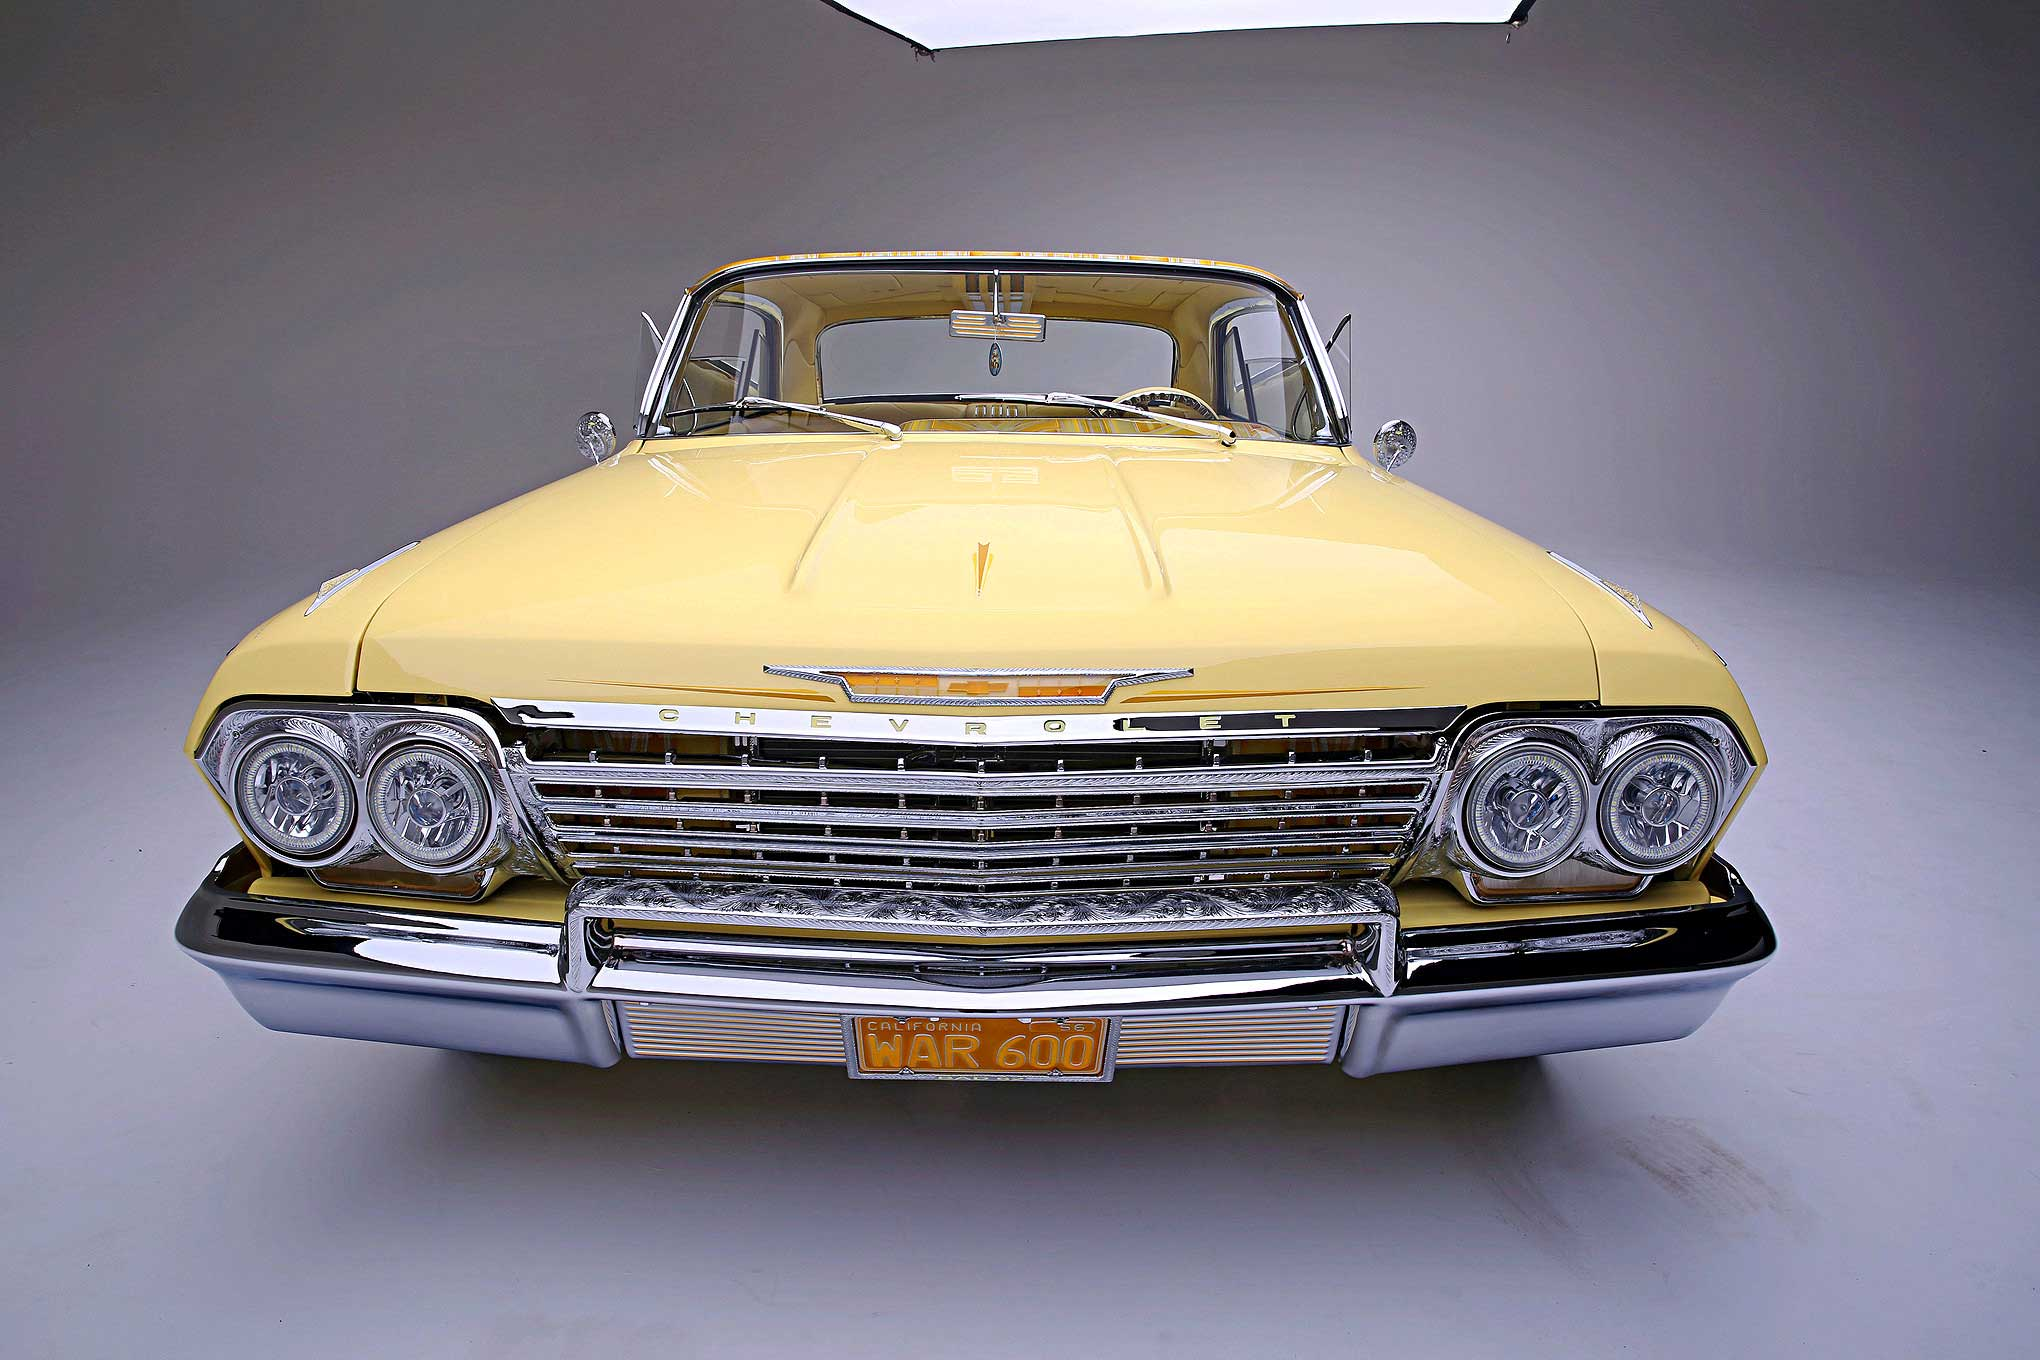 1962 Chevrolet Impala Breaking The Mold Breaking Bad